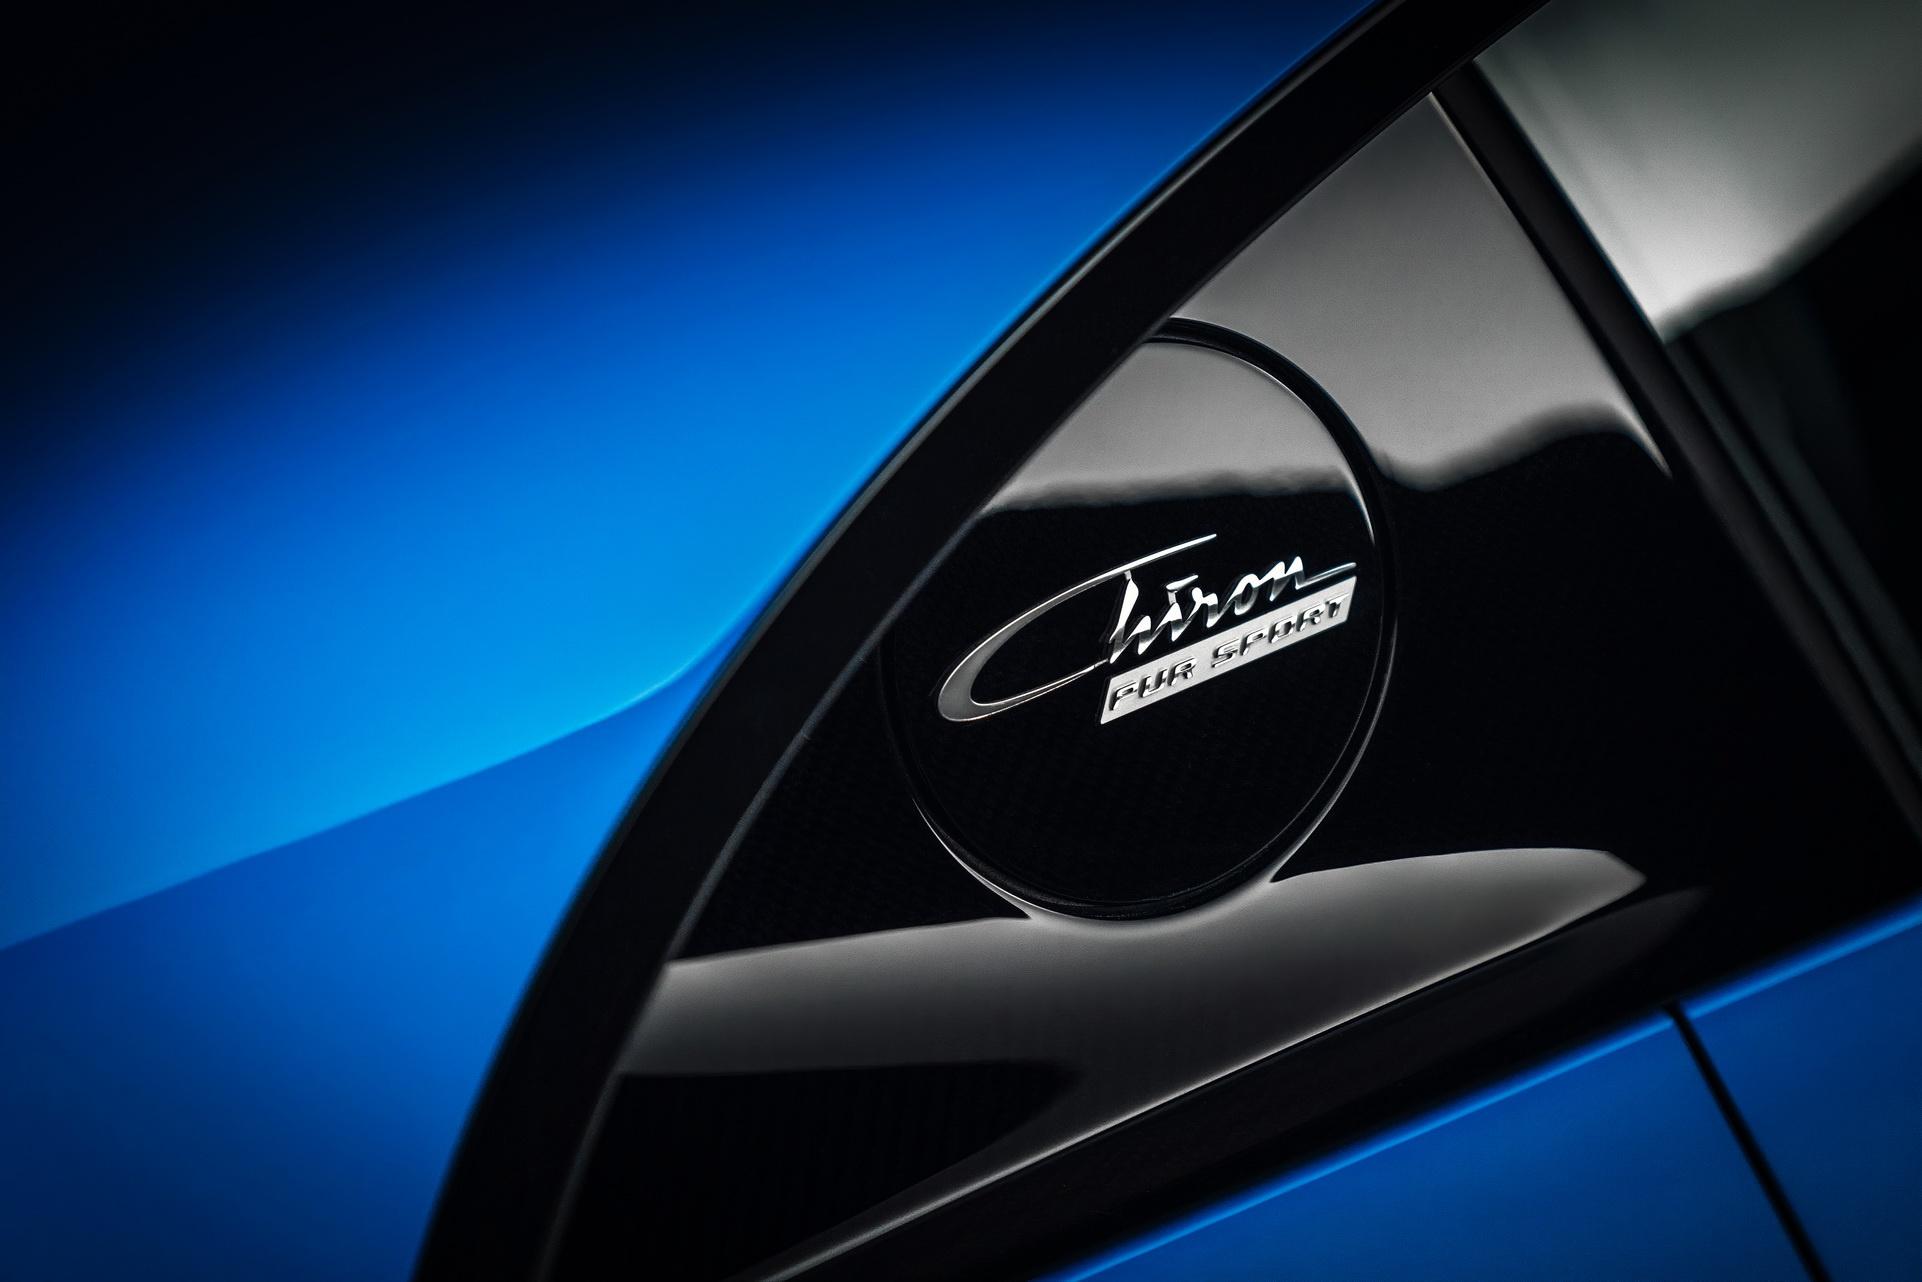 Bugatti Chiron phien ban moi ra mat - sieu xe gia 3,55 trieu USD hinh anh 16 B6.jpg